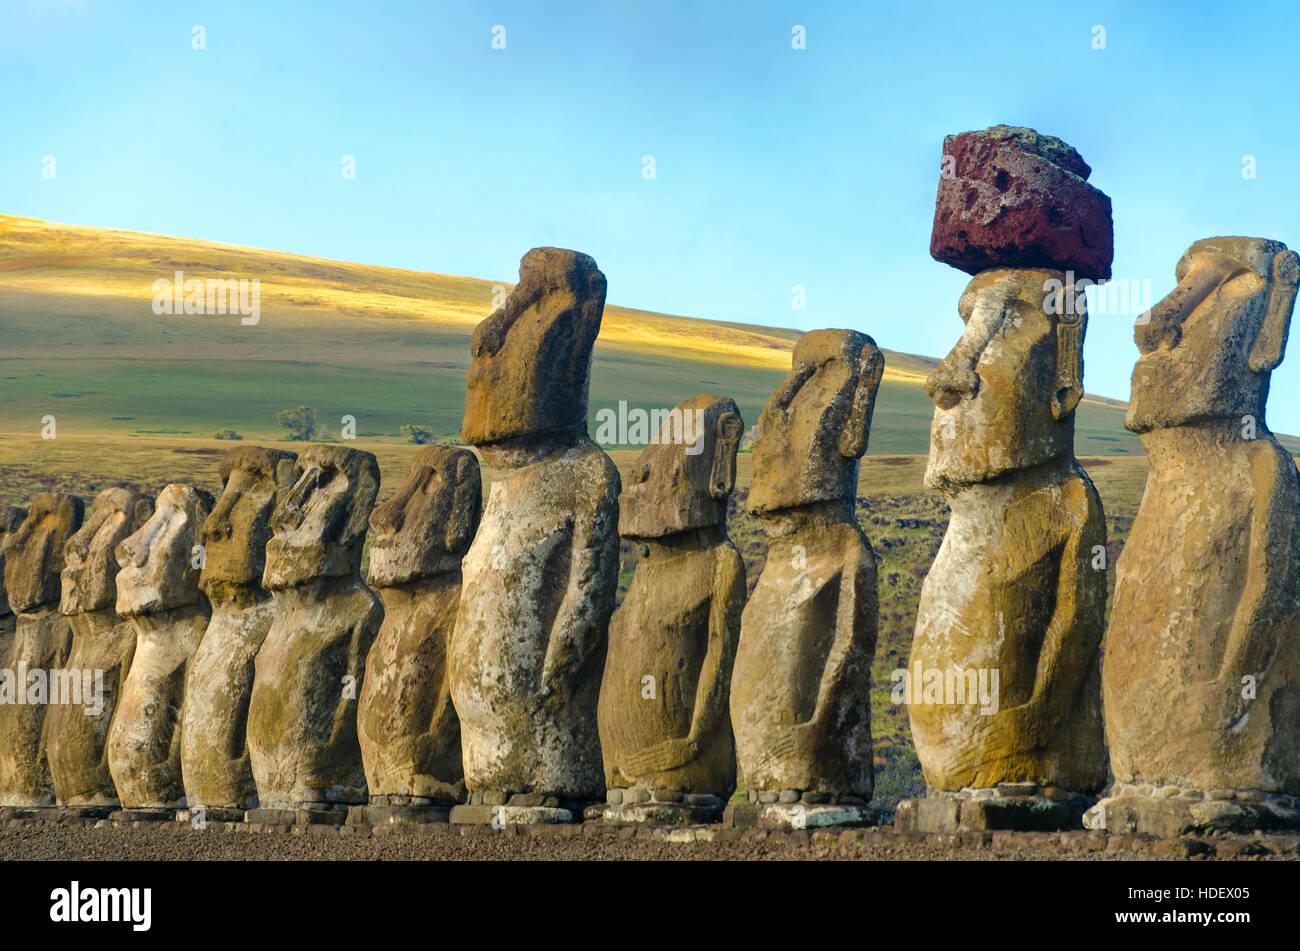 Primer plano de una fila de Moai en Ahu Tongariki en la Isla de Pascua en Chile Imagen De Stock